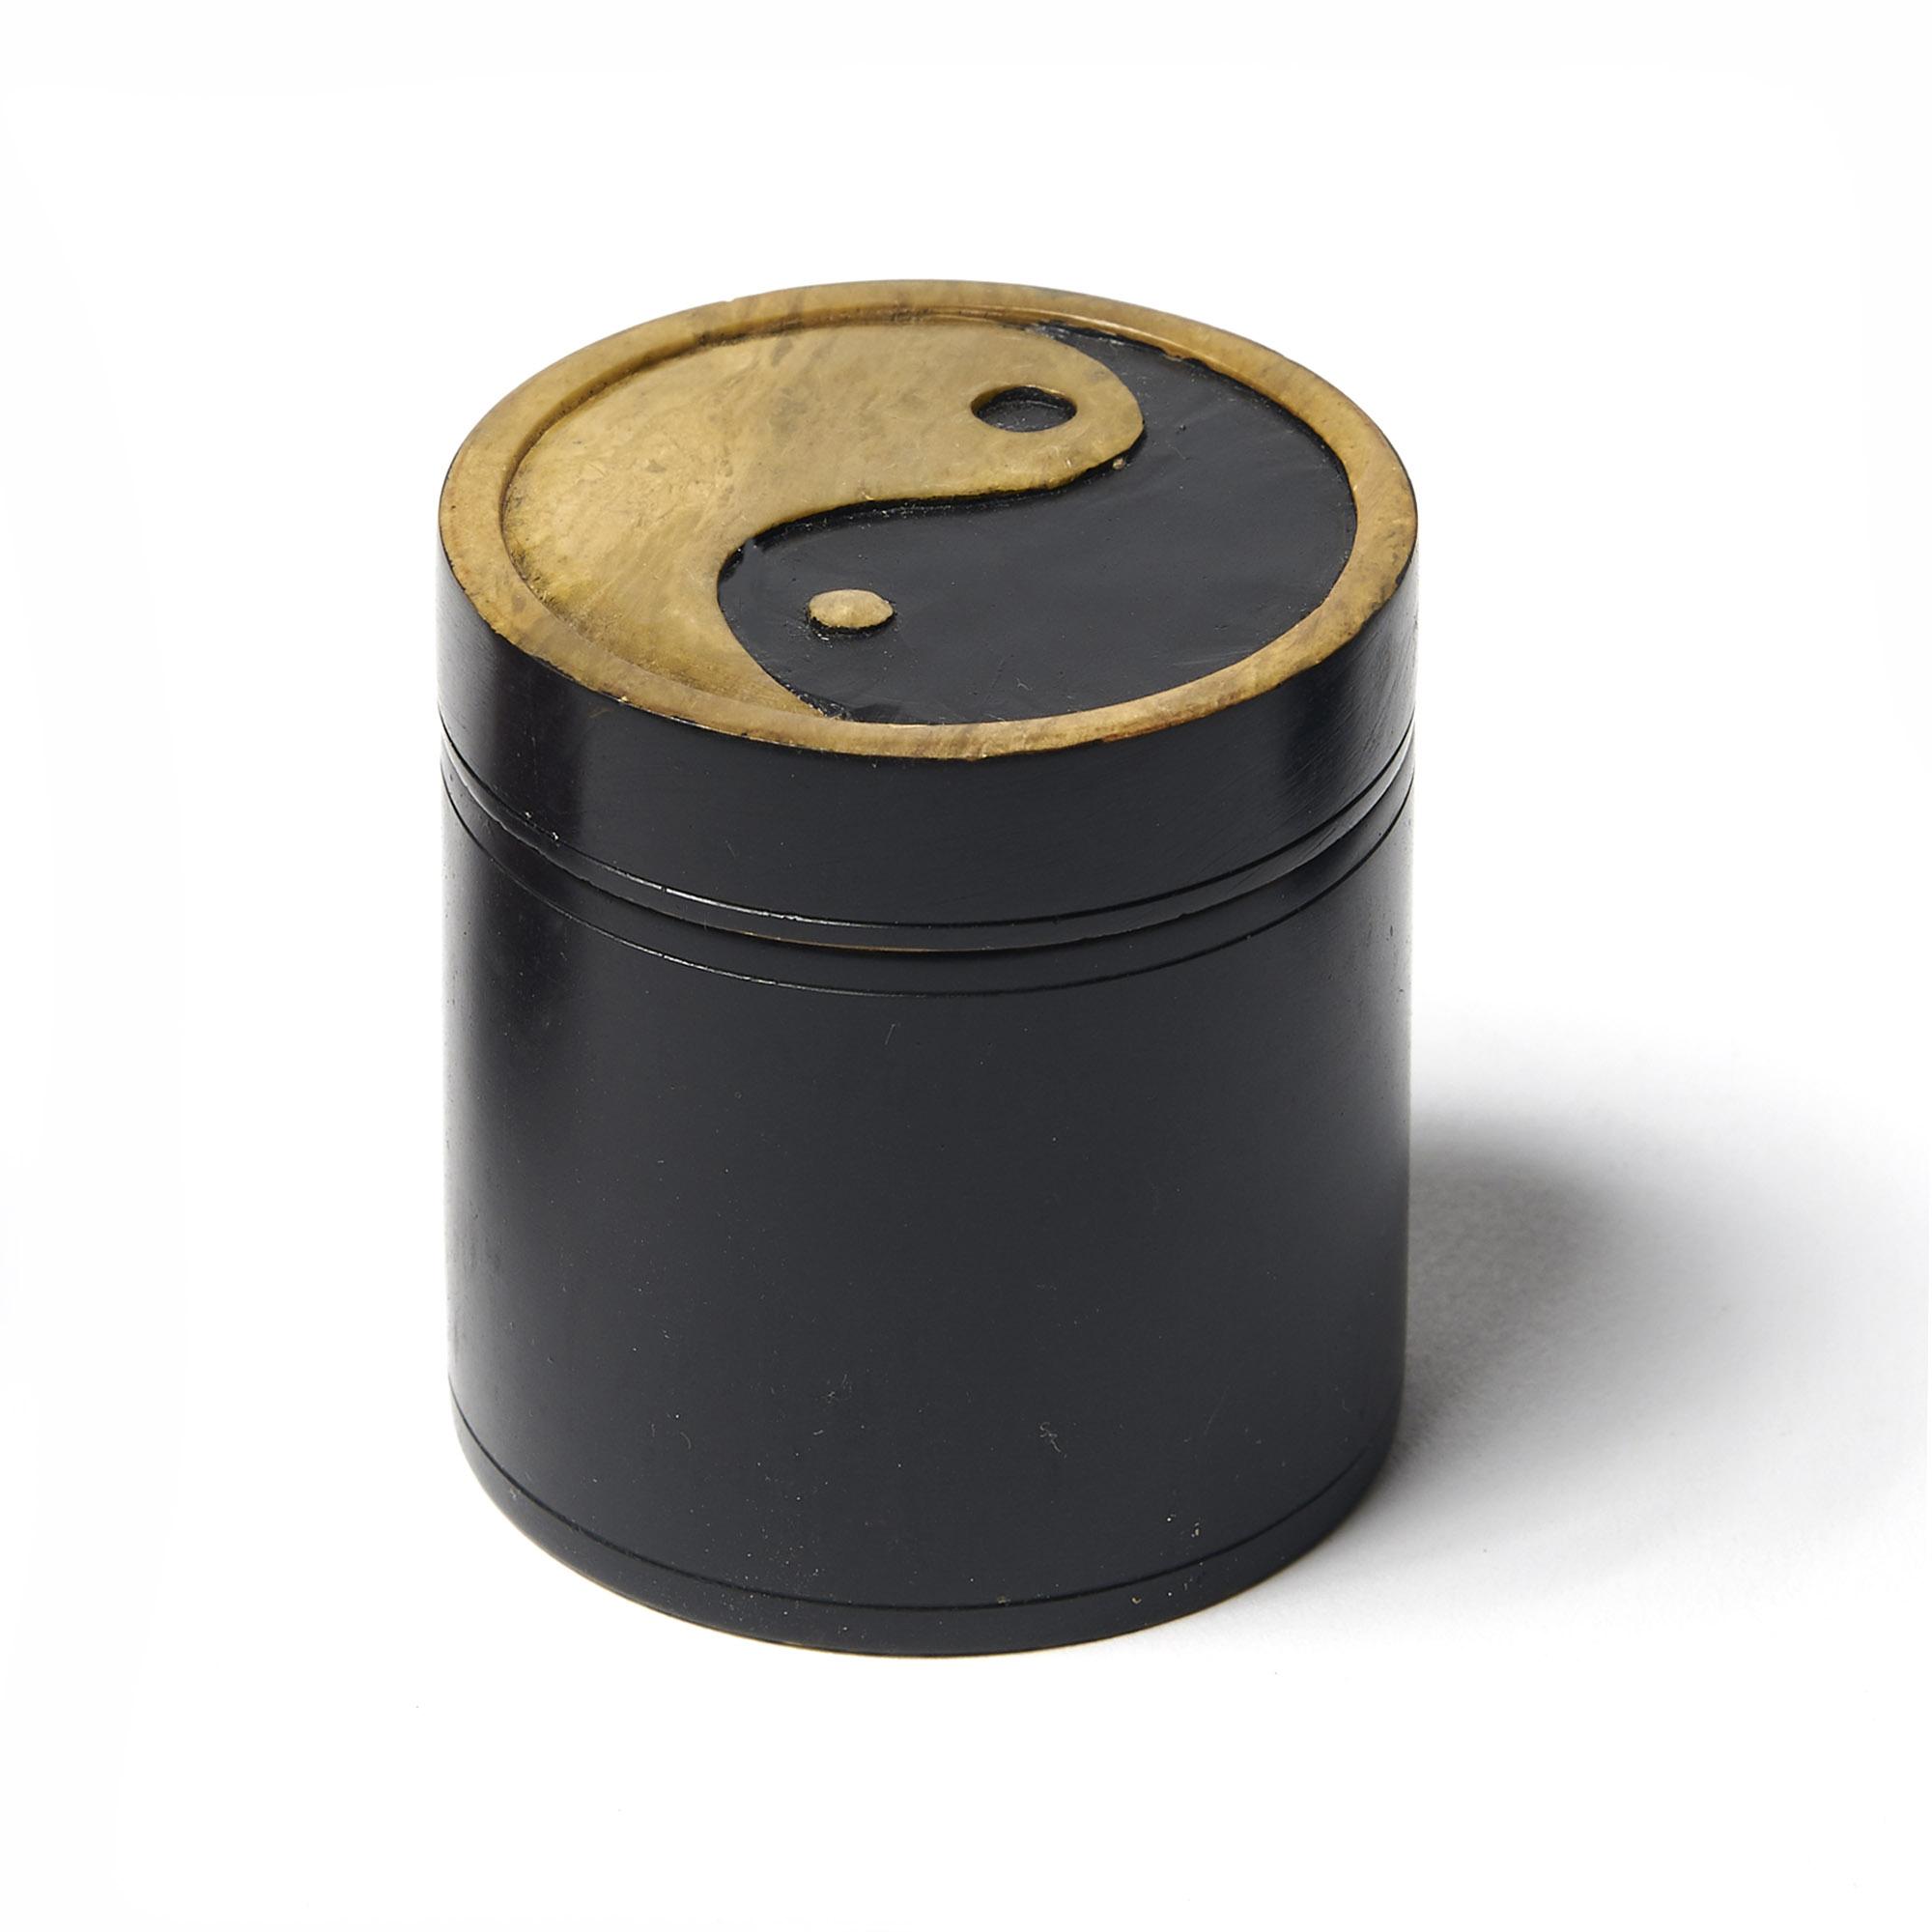 Caja piedra redonda negra Ying Yang